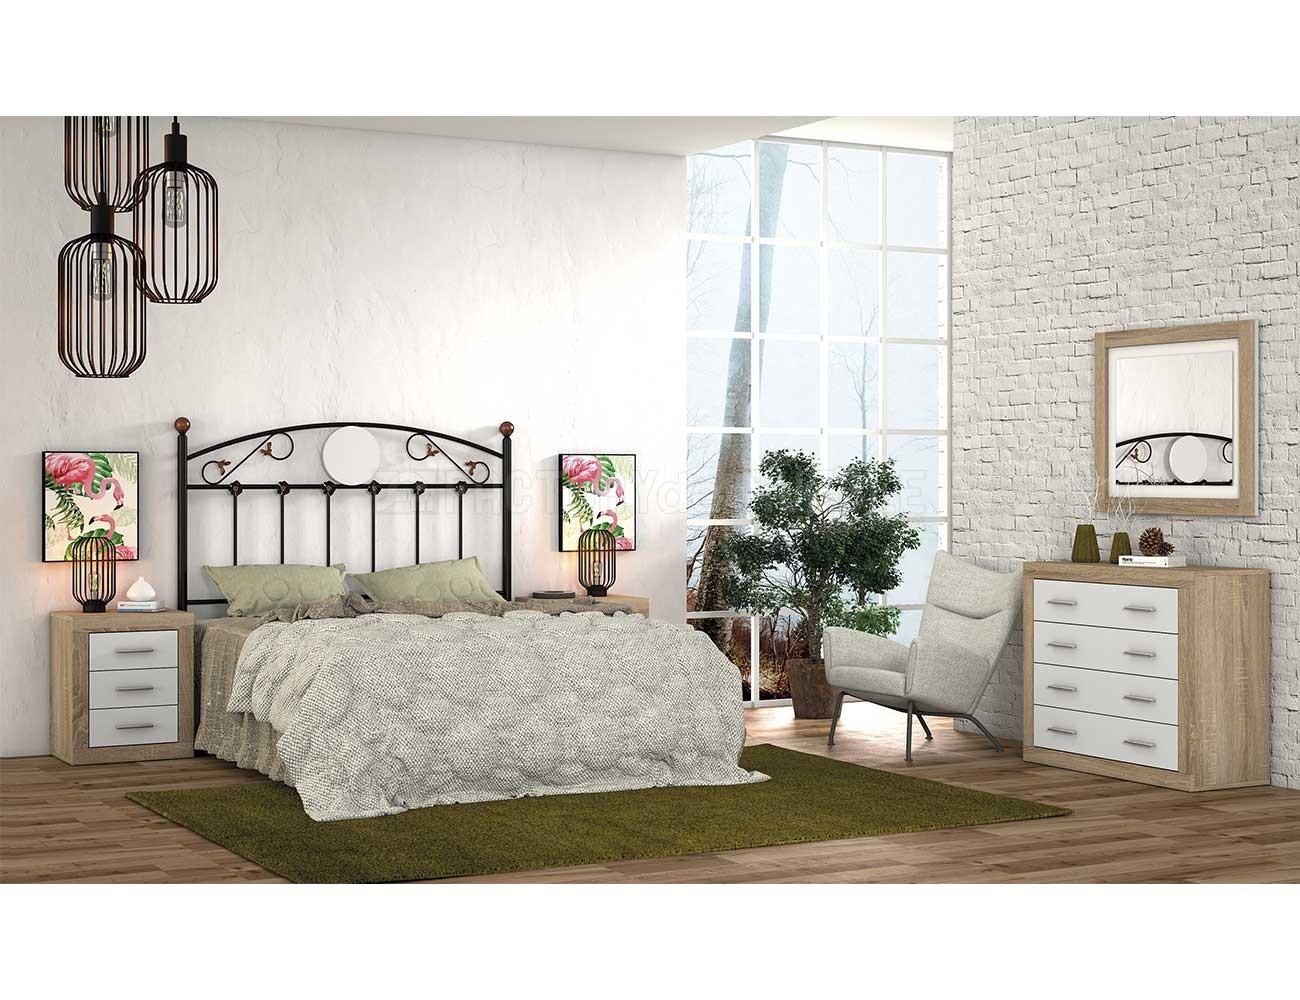 Dormitorio matrimonio con cabecero de forja 54